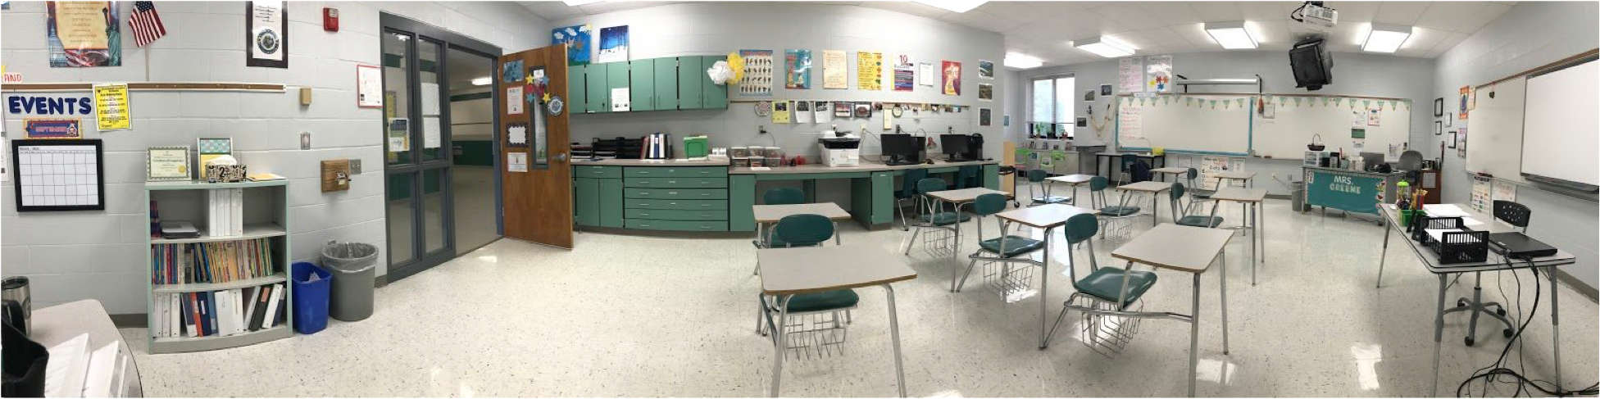 North Carolina Classroom